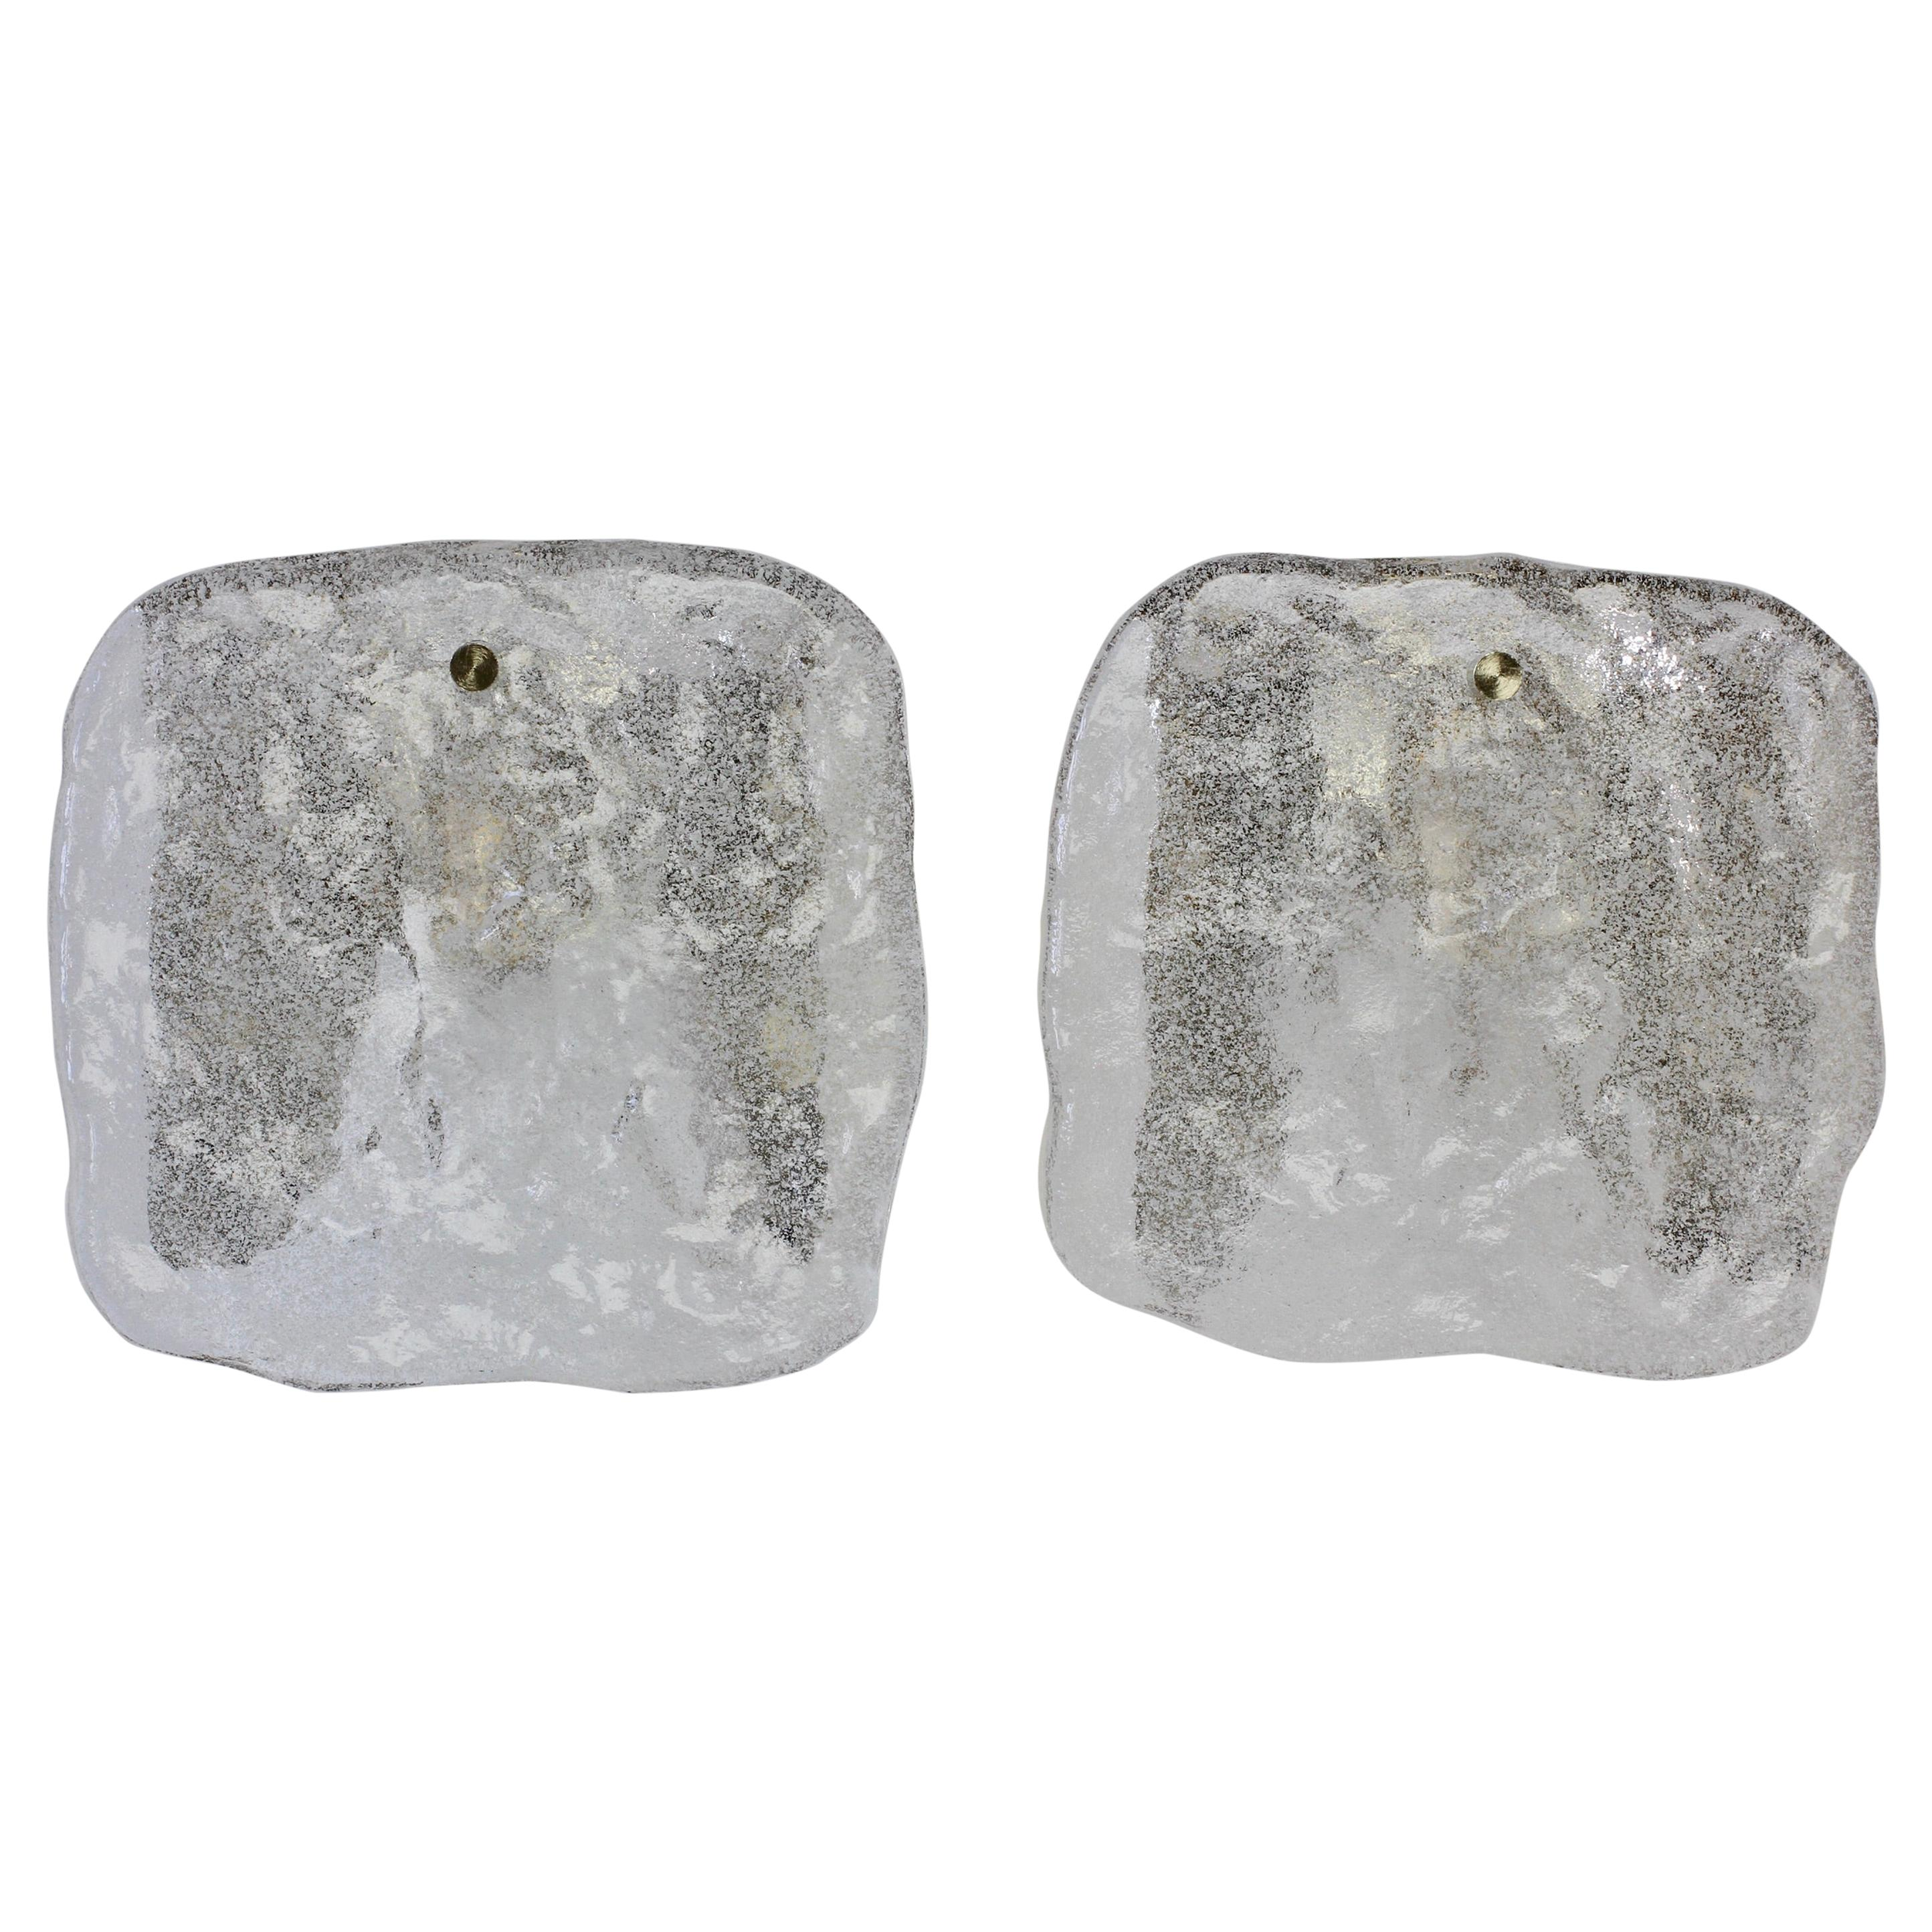 "Kalmar Pair of Pulegoso ""Foam"" Glass Wall Lights or Vanity Sconces /Lamps, 1970s"